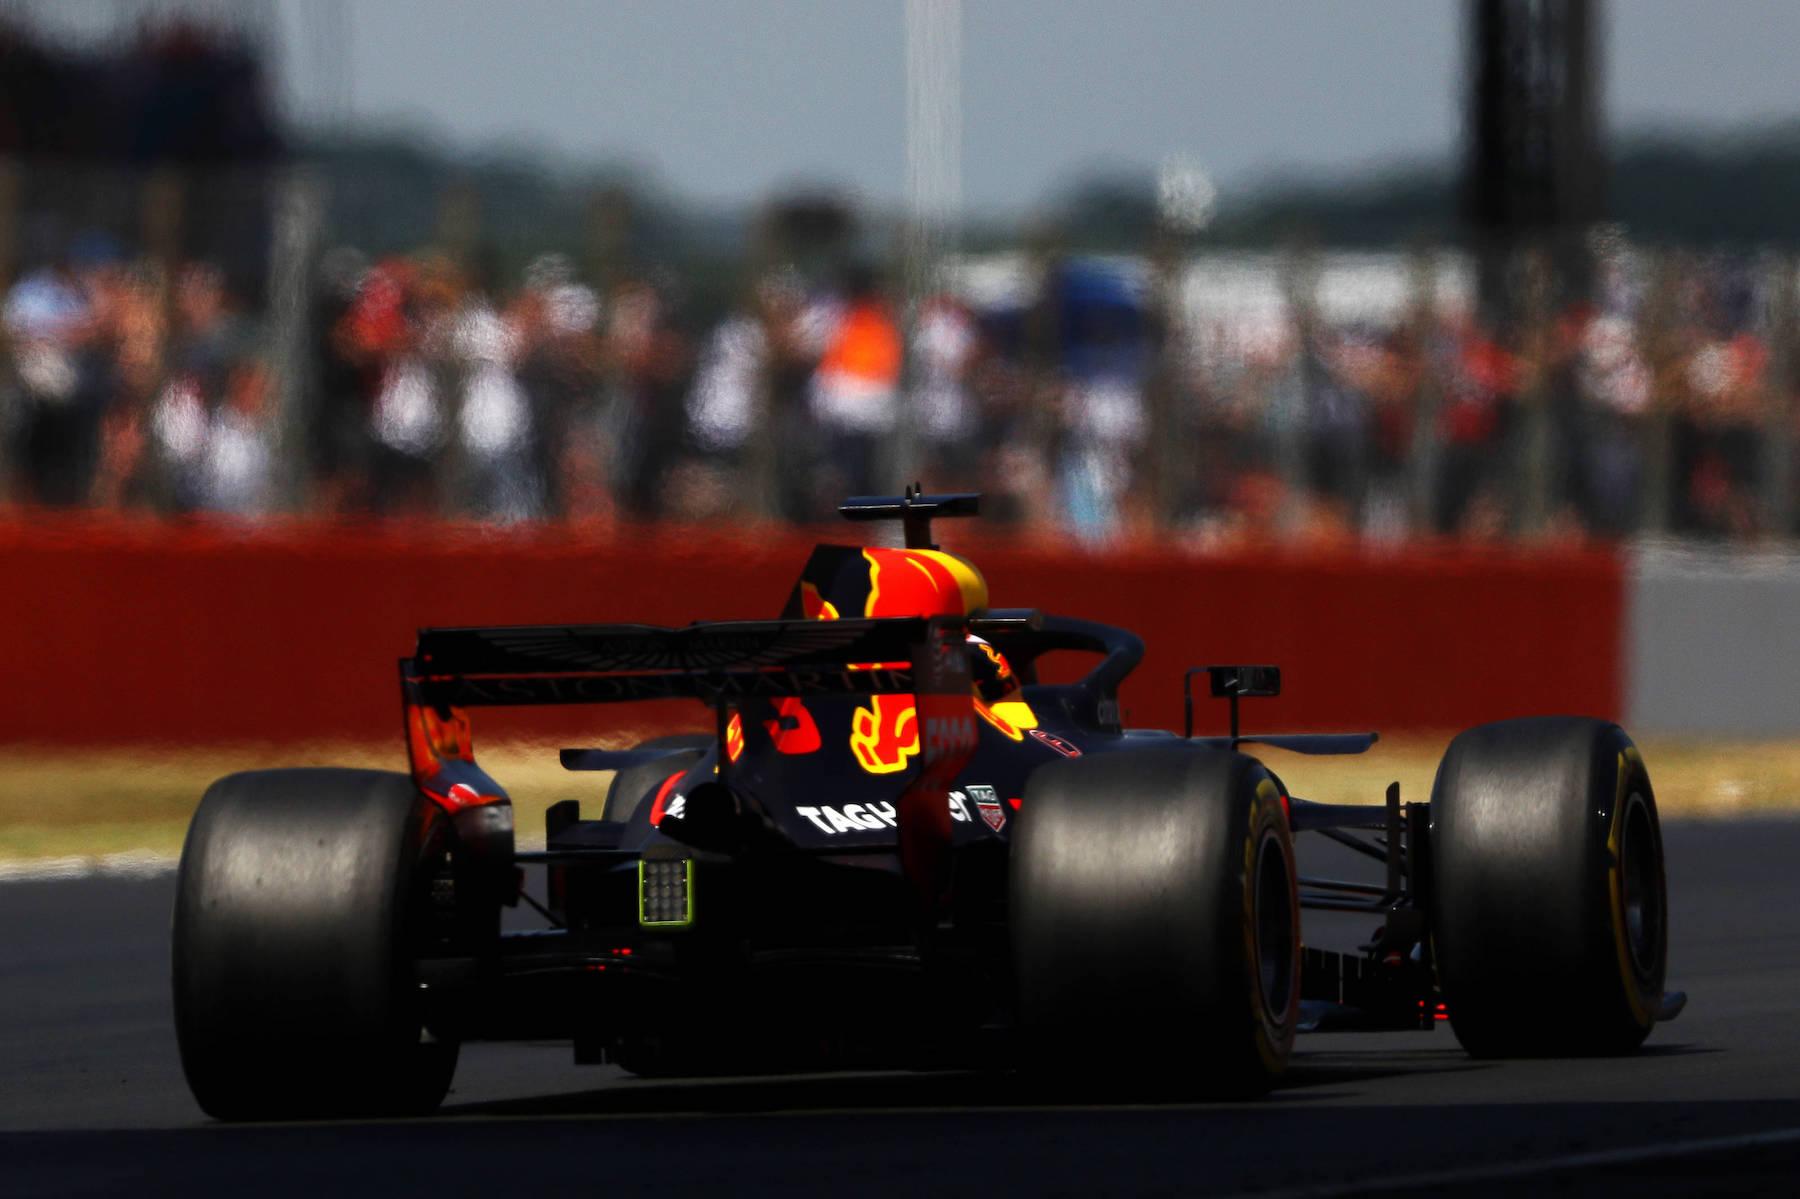 H 2018 Daniel Ricciardo | Red Bull RB14 | 2018 British GP 1 copy.jpg